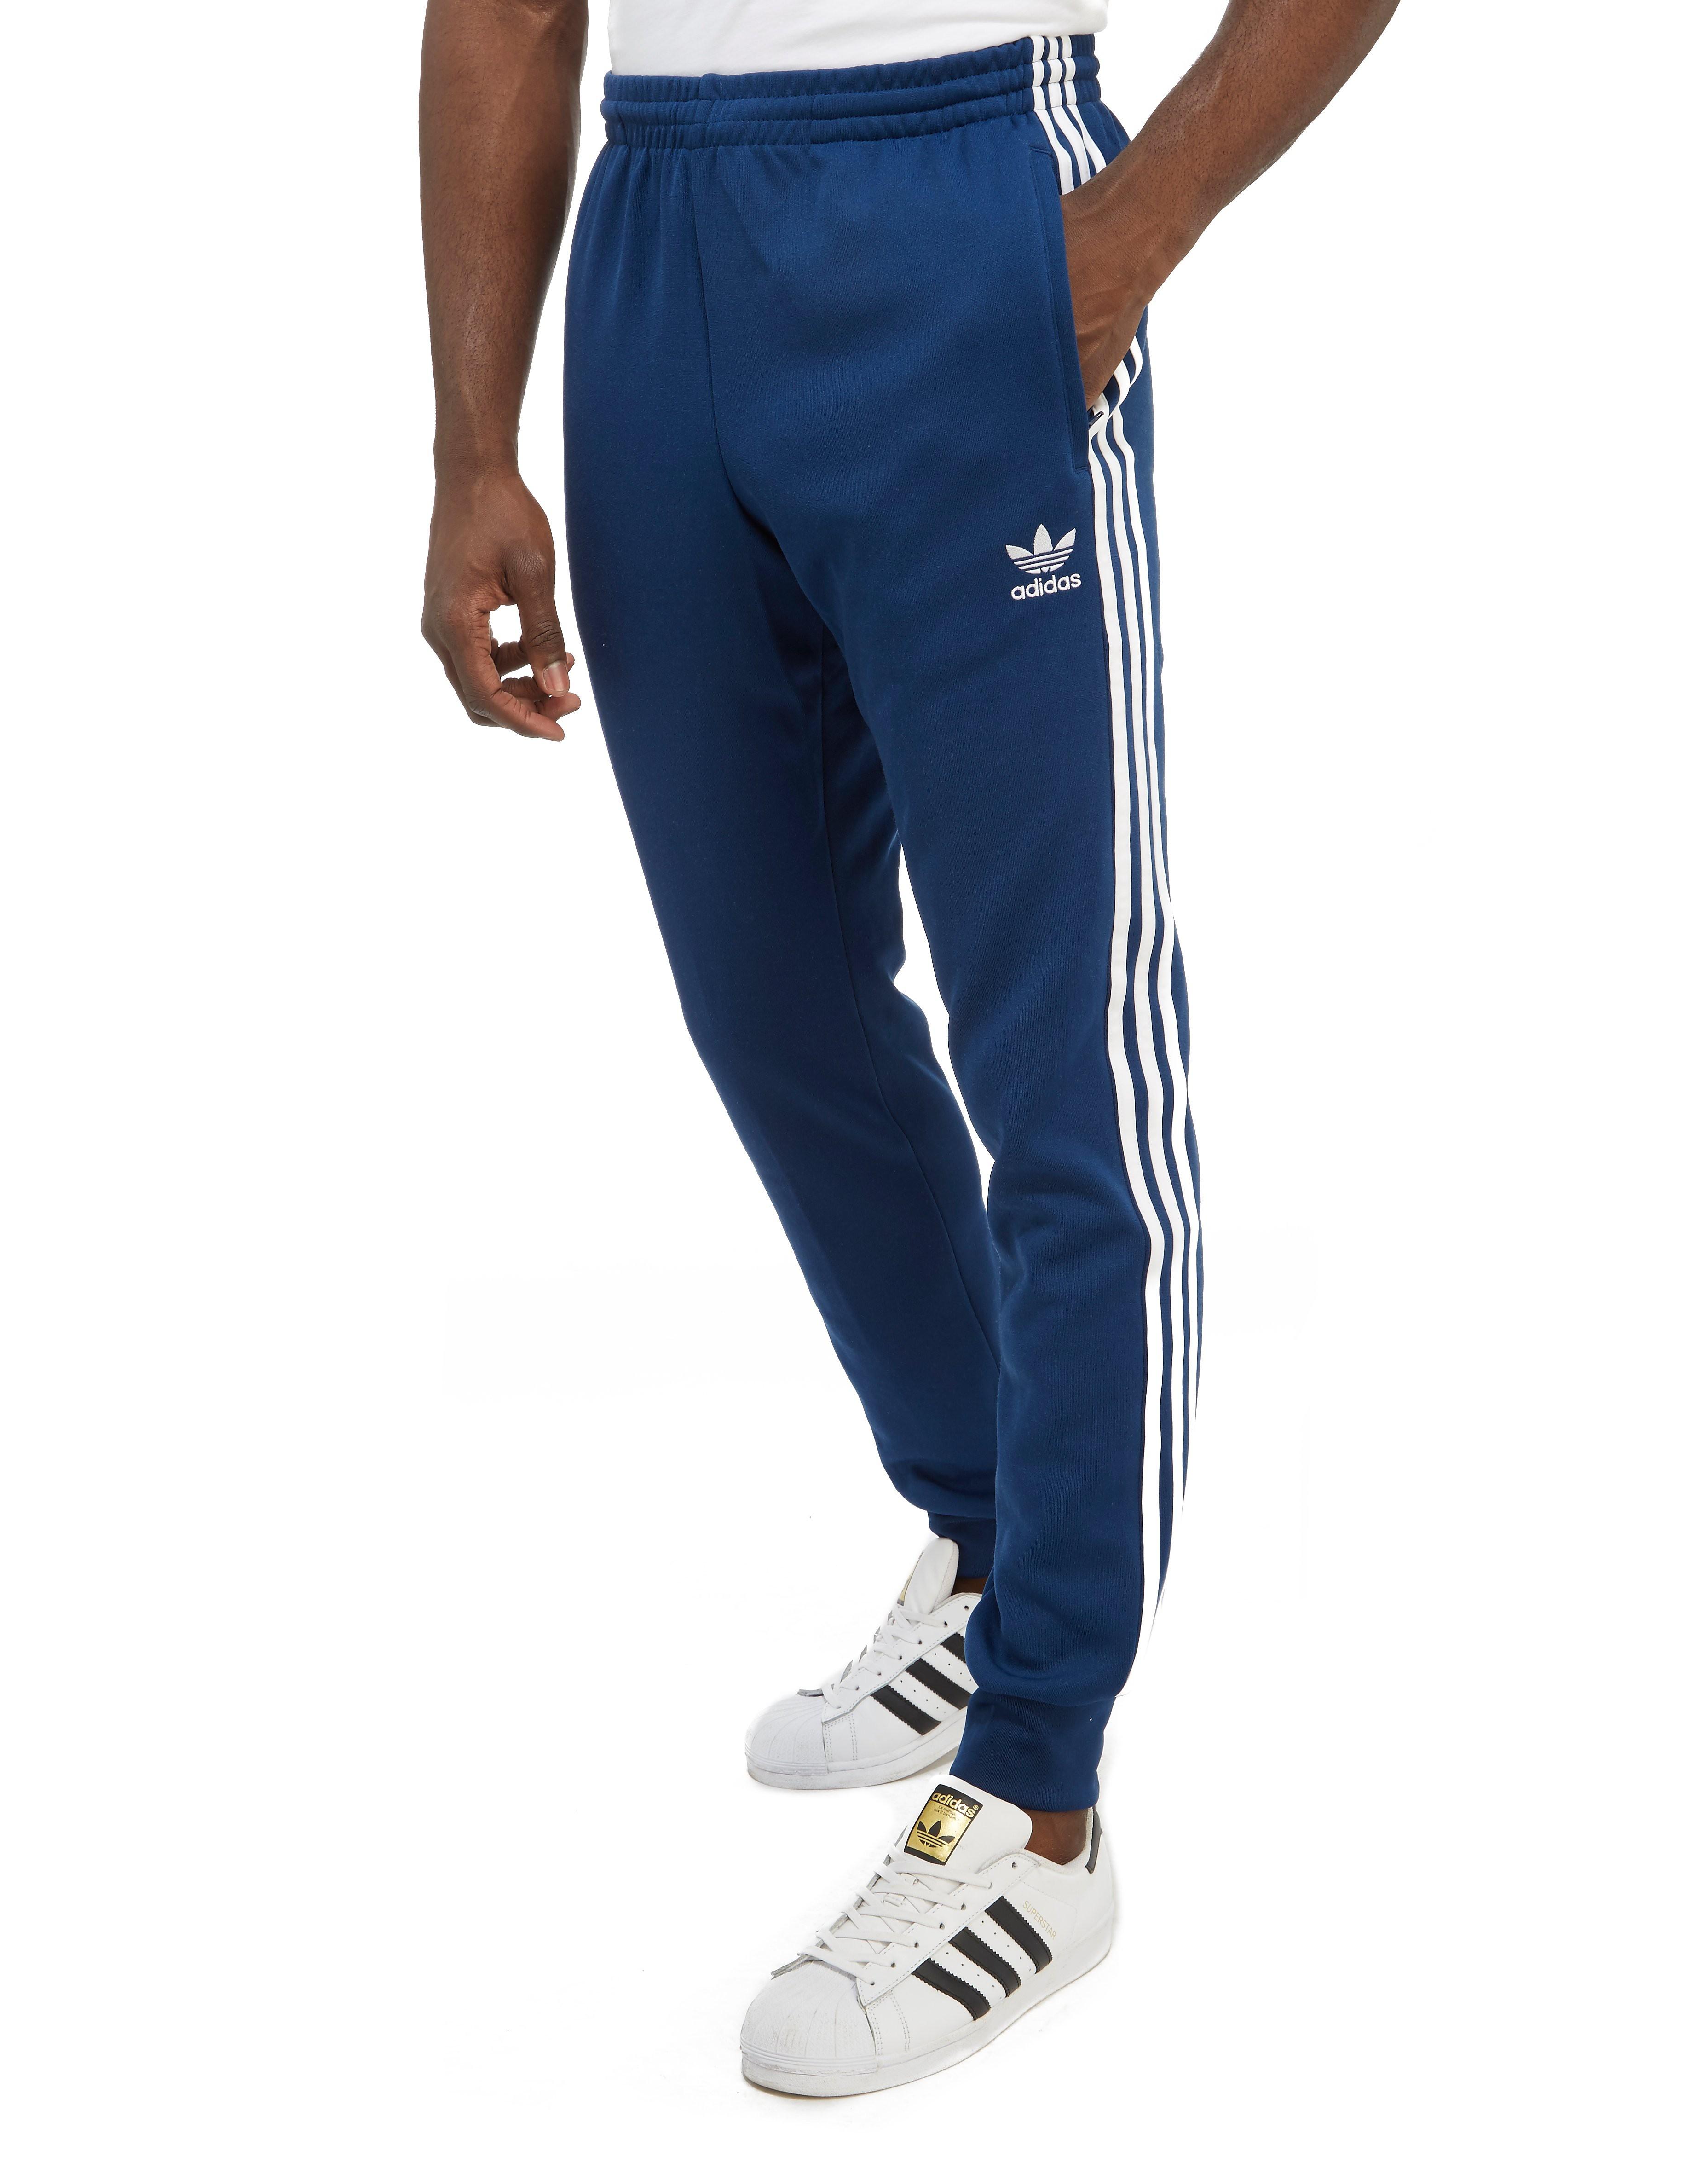 adidas Originals 3-Stripes Superstar Track Pants